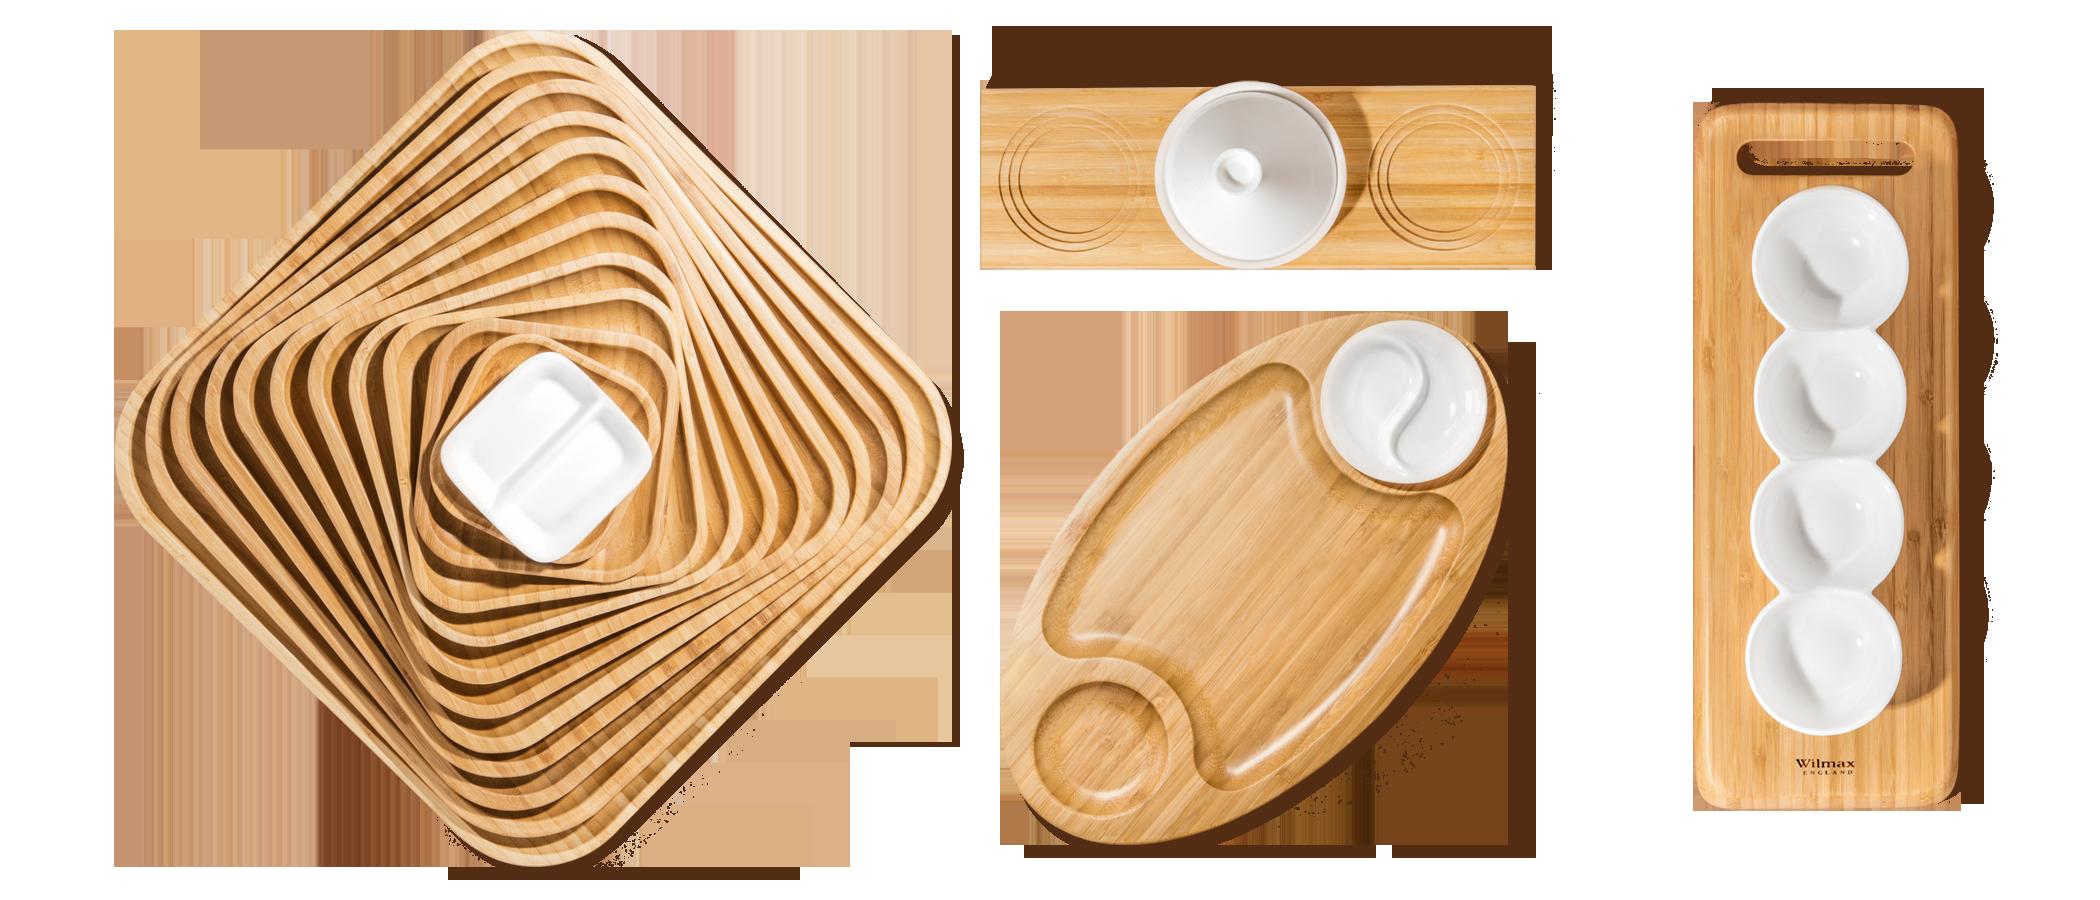 Коллекция из натурального Бамбука Wilmax